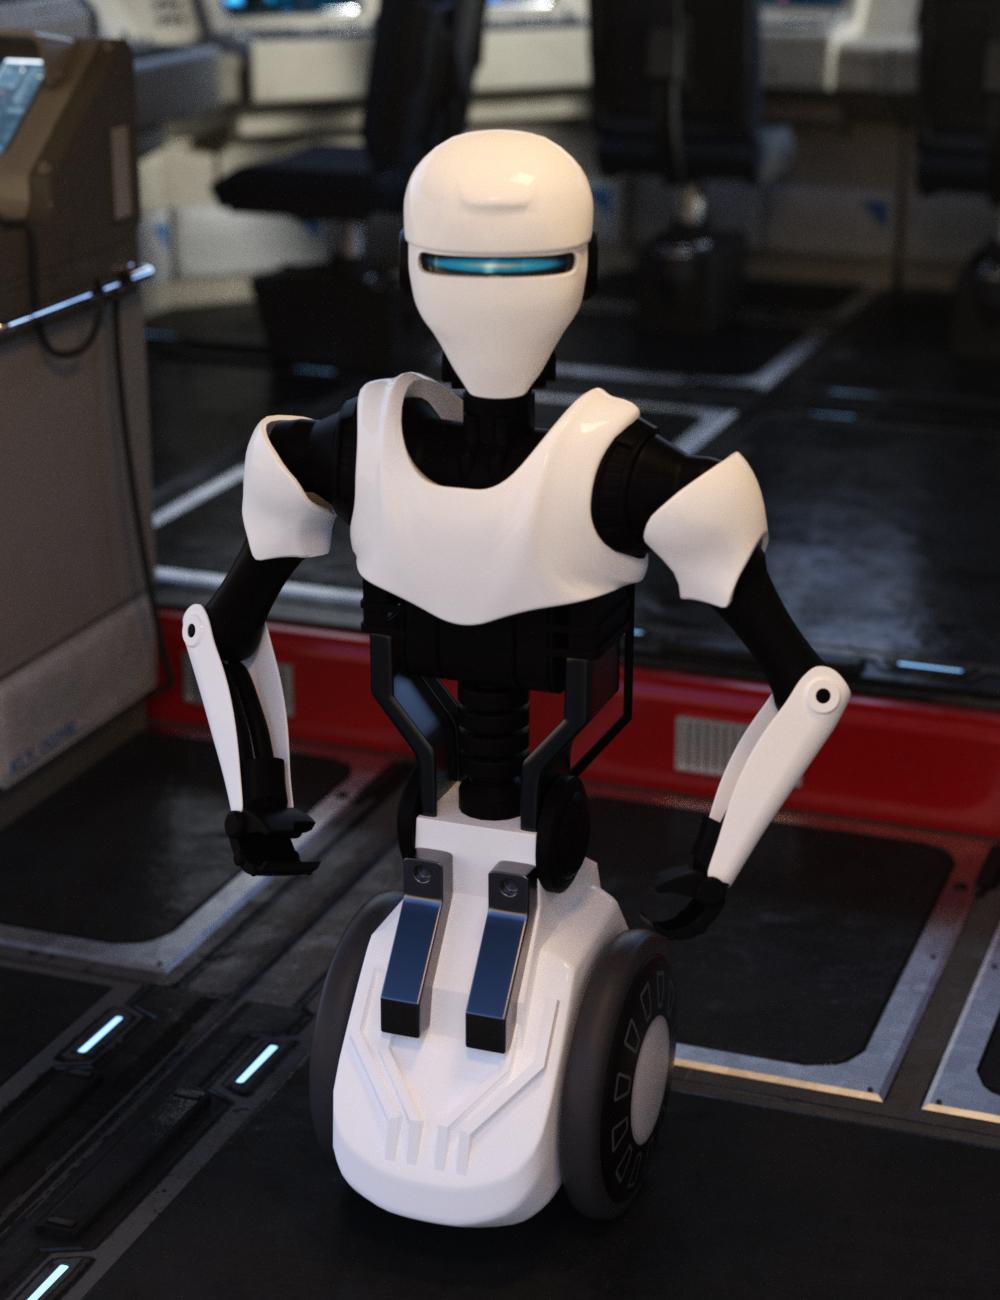 Service Robot by: Charlie, 3D Models by Daz 3D